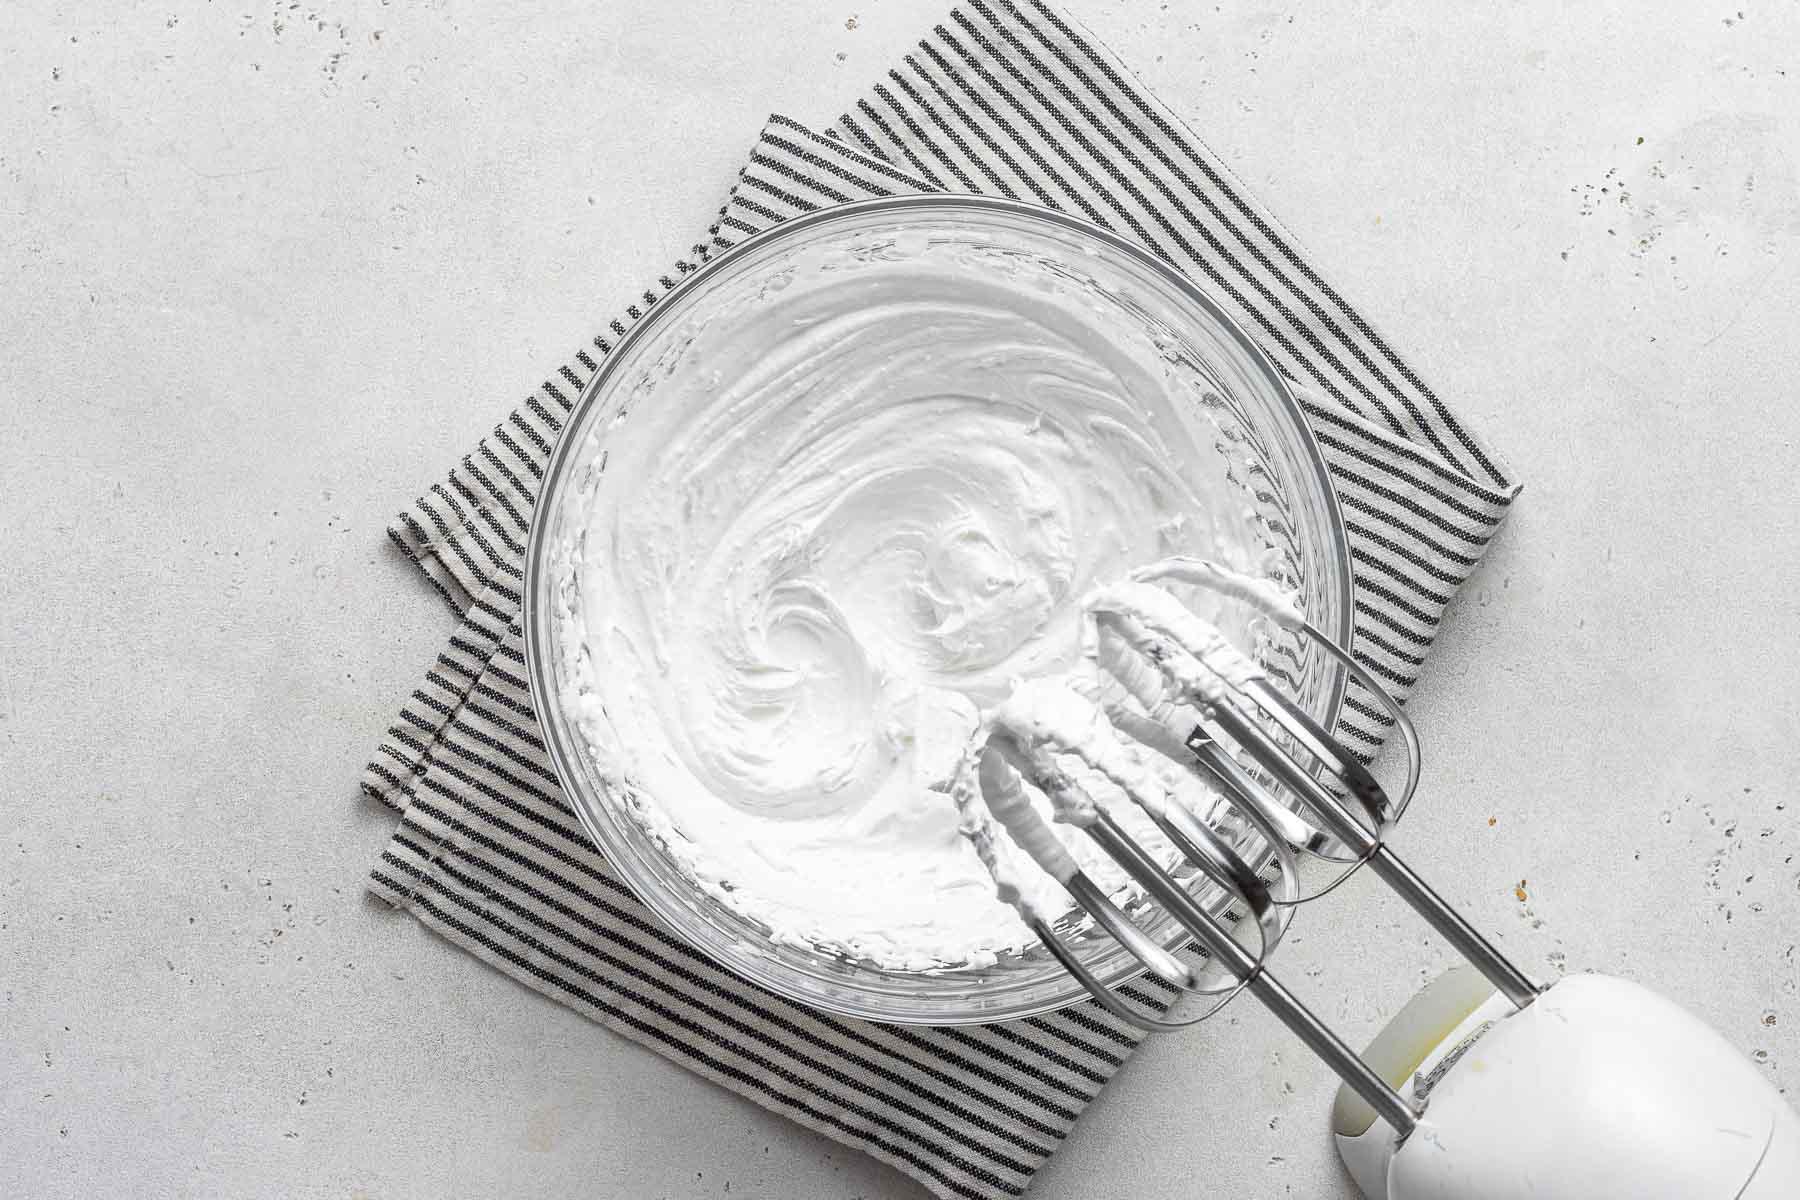 Properly beaten egg whites with stiff peaks.